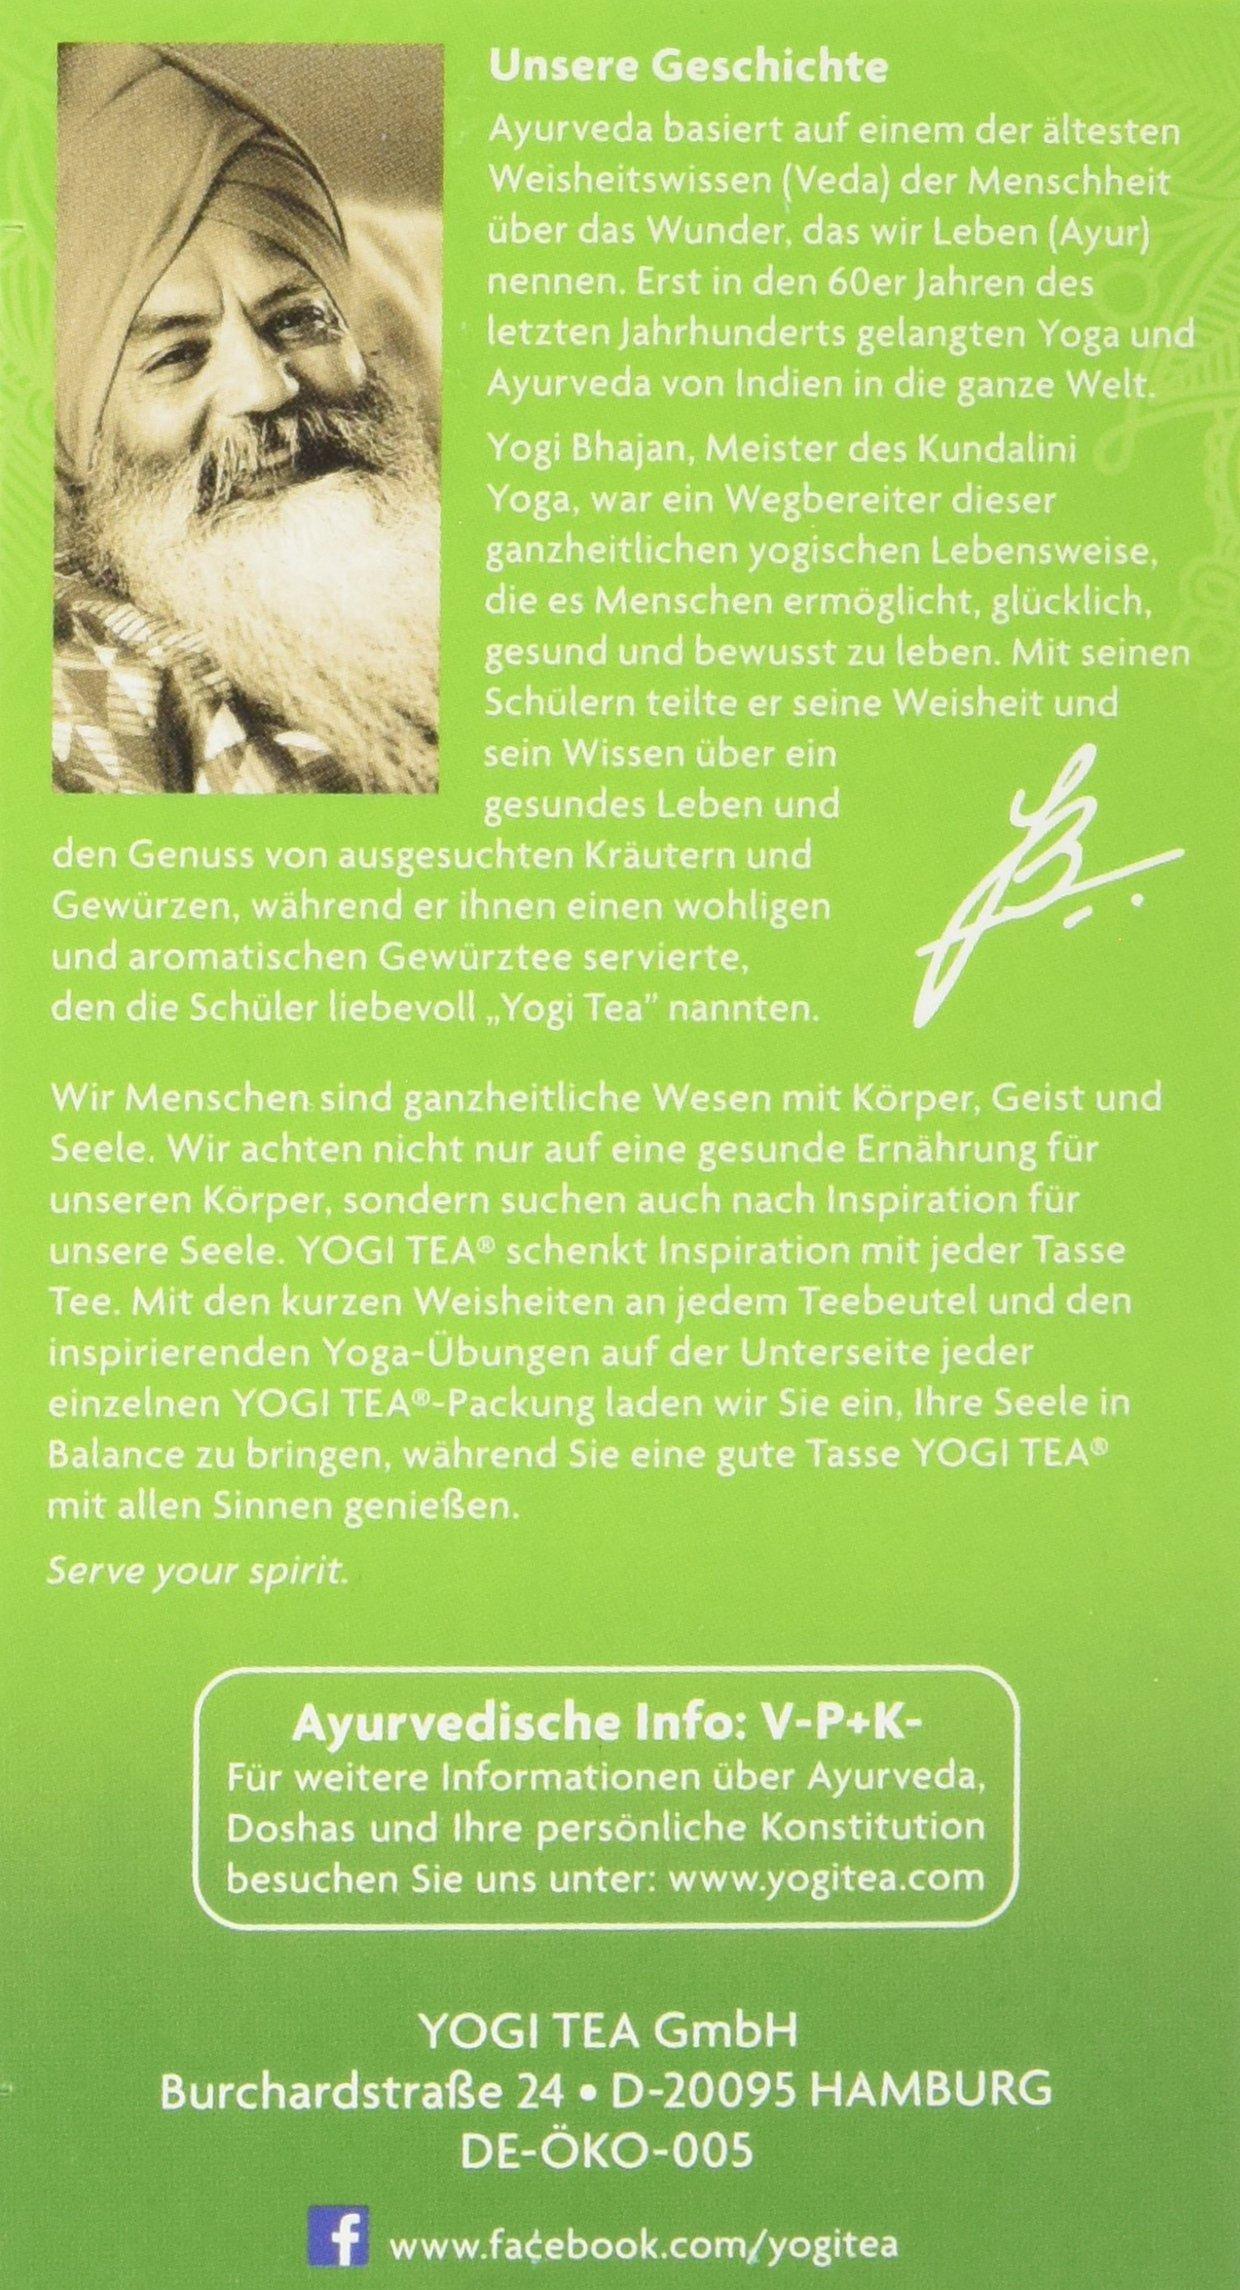 Yogi-Tea-Grner-Morgen-Bio-3er-Pack-3-x-306-g